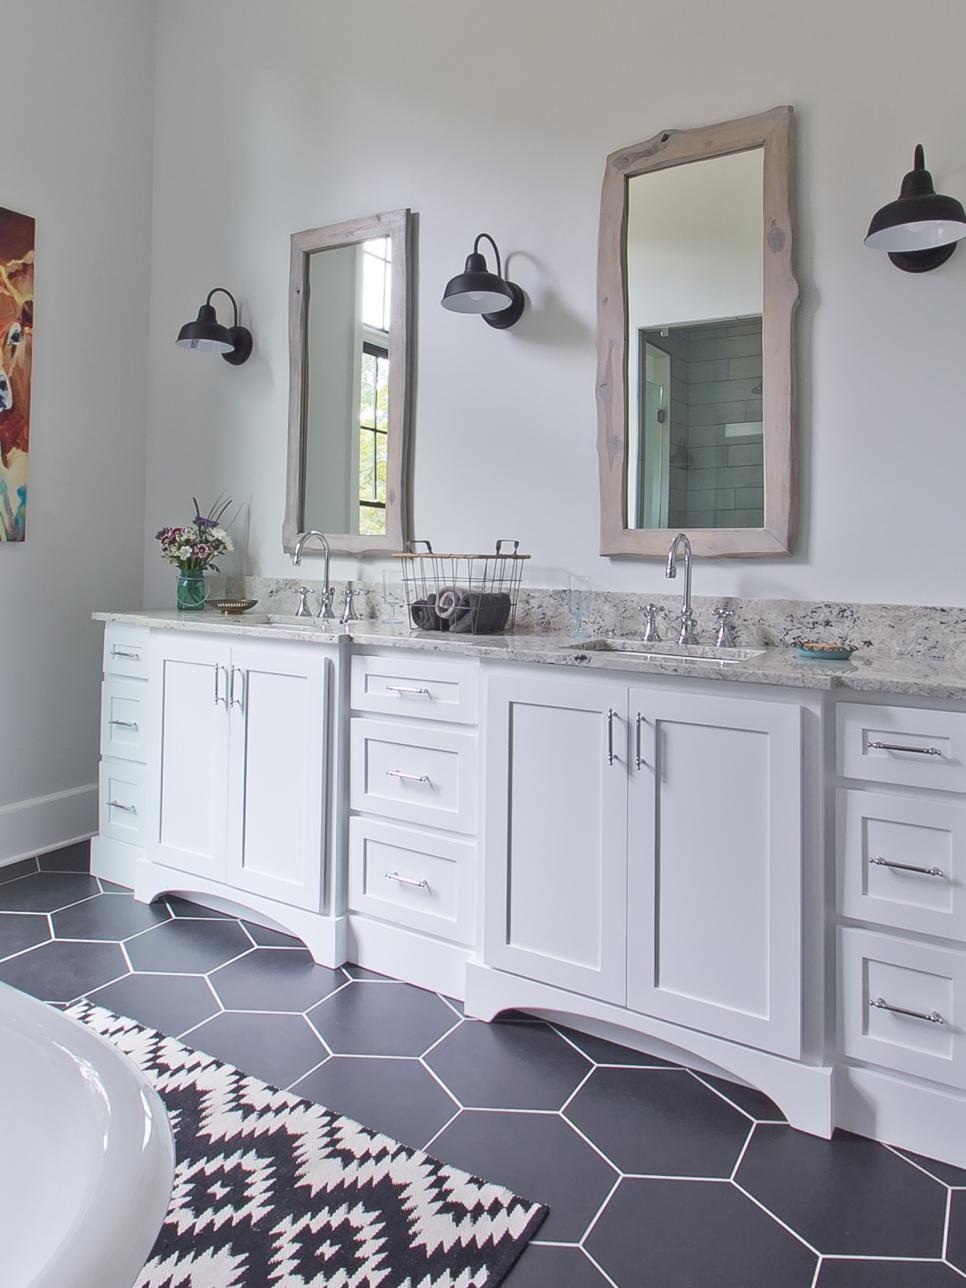 Small Bathroom Ideas On A Budget Hgtv White Vanity Bathroom Diy Bathroom Design Master Bathroom Vanity